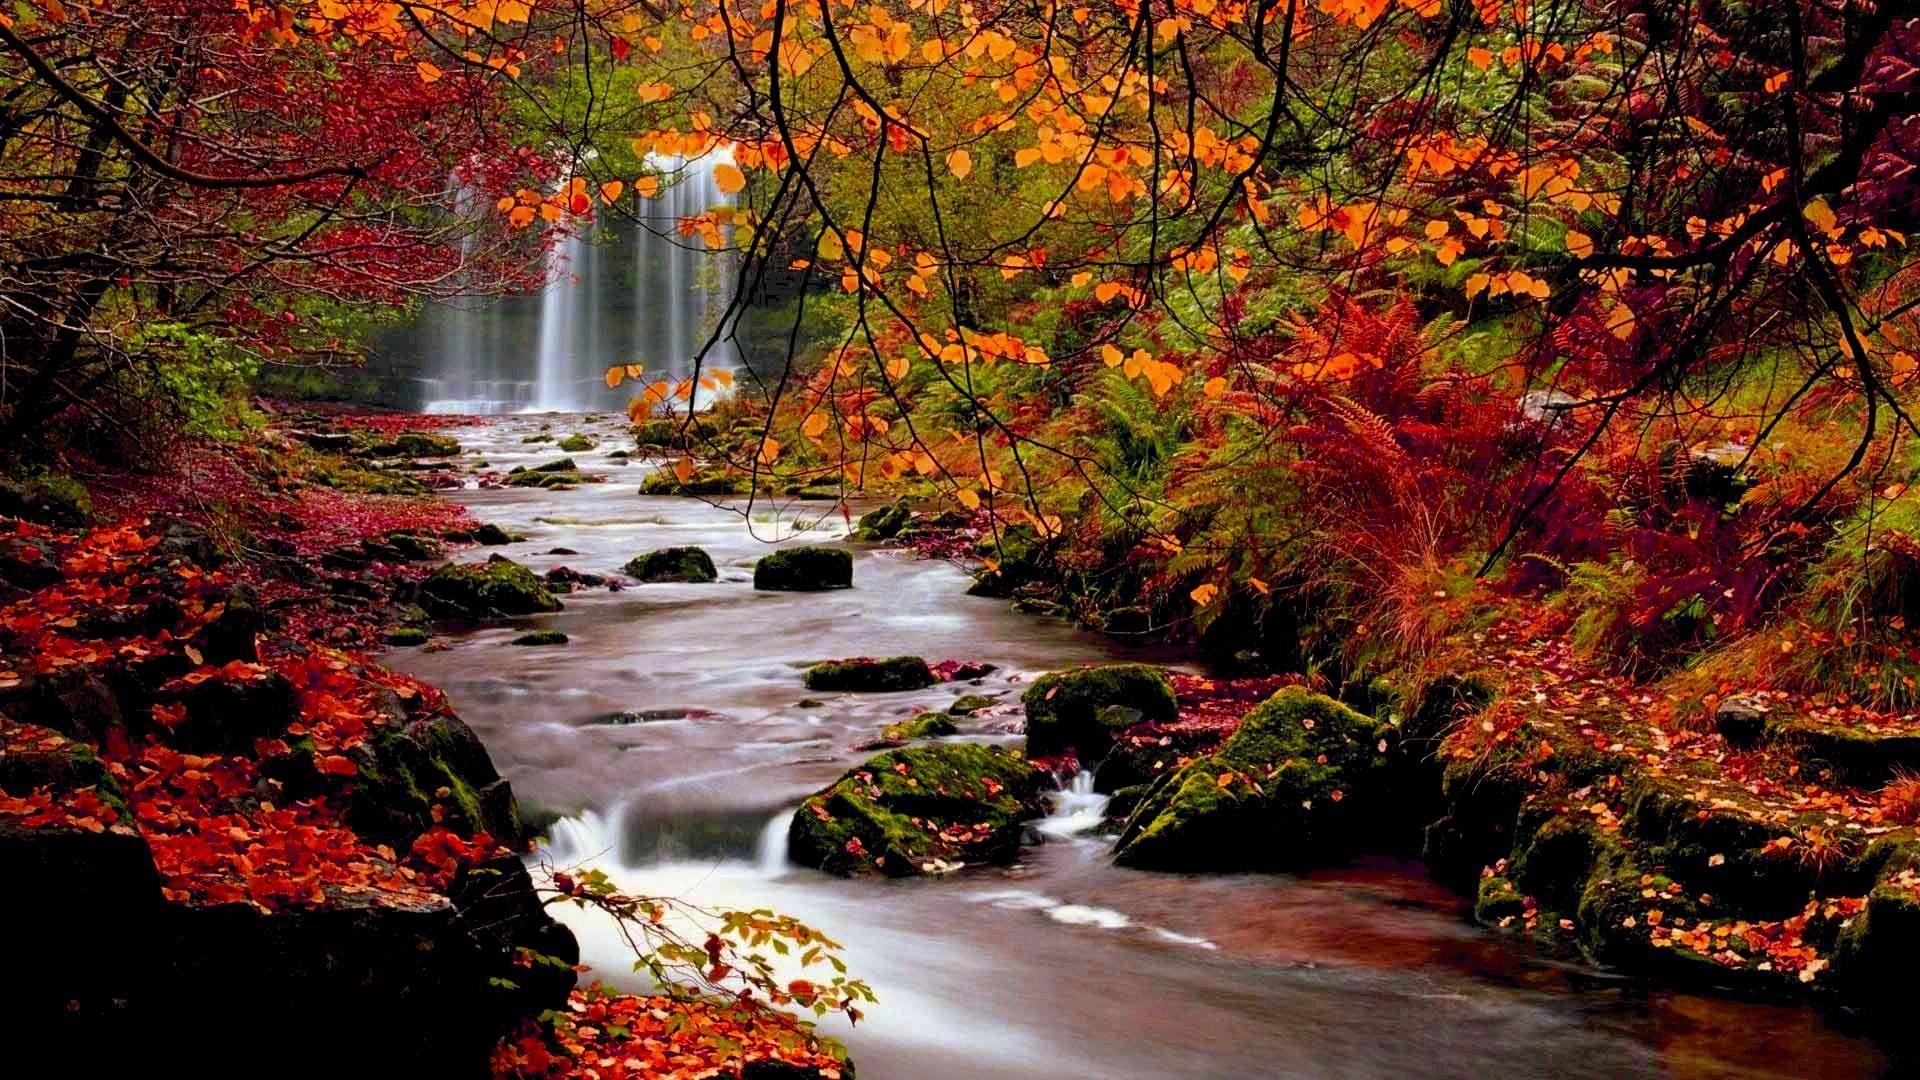 Fall Trees Autumn Trees Nature Landscape Leaf Leaves